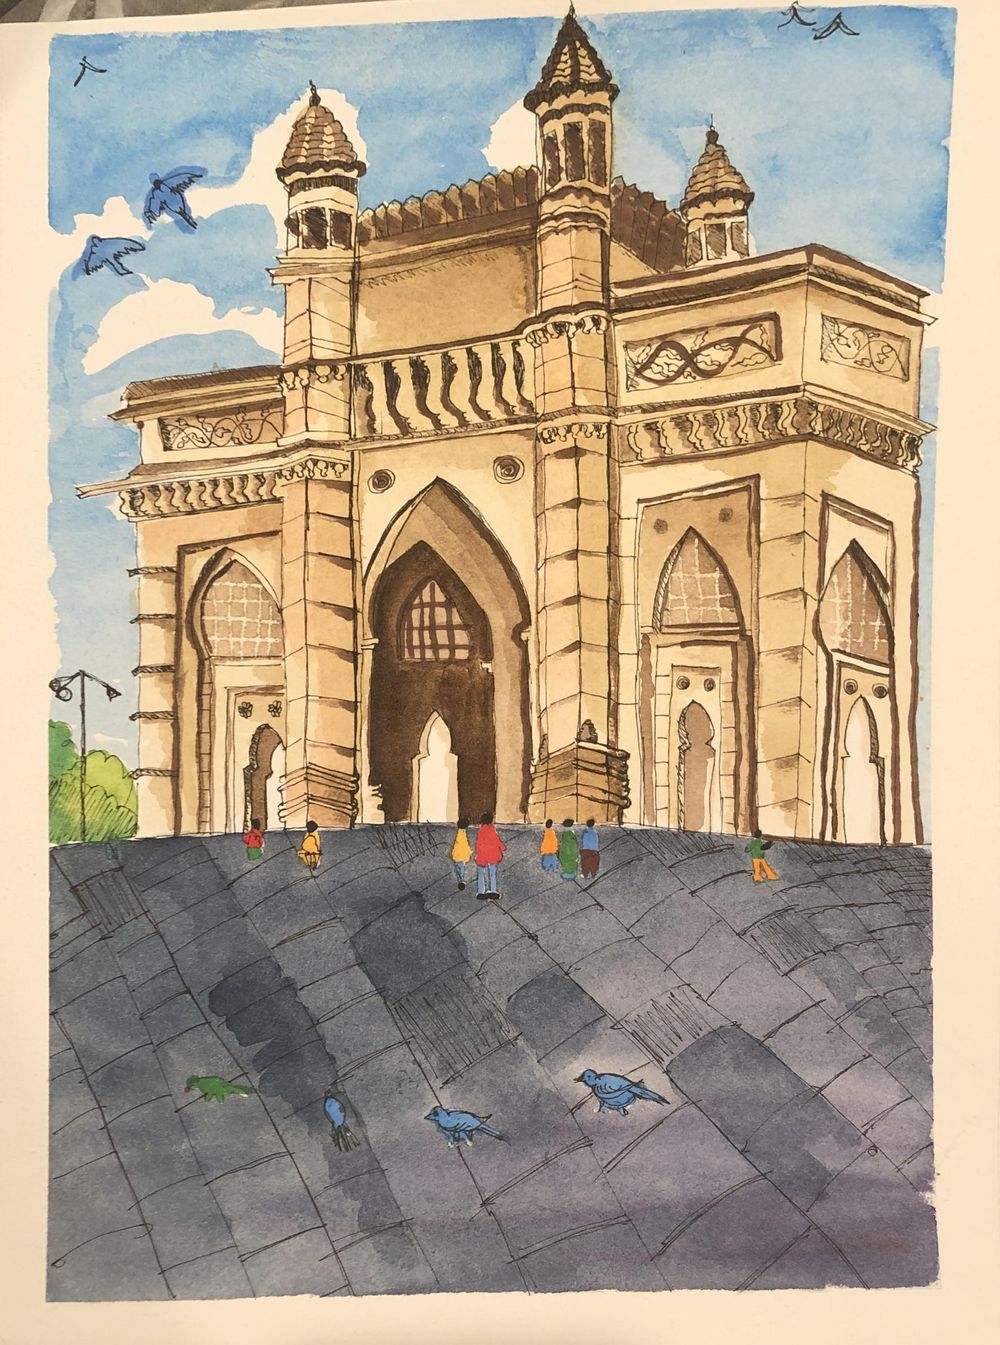 Gate way of India - Mumbai - image 1 - student project